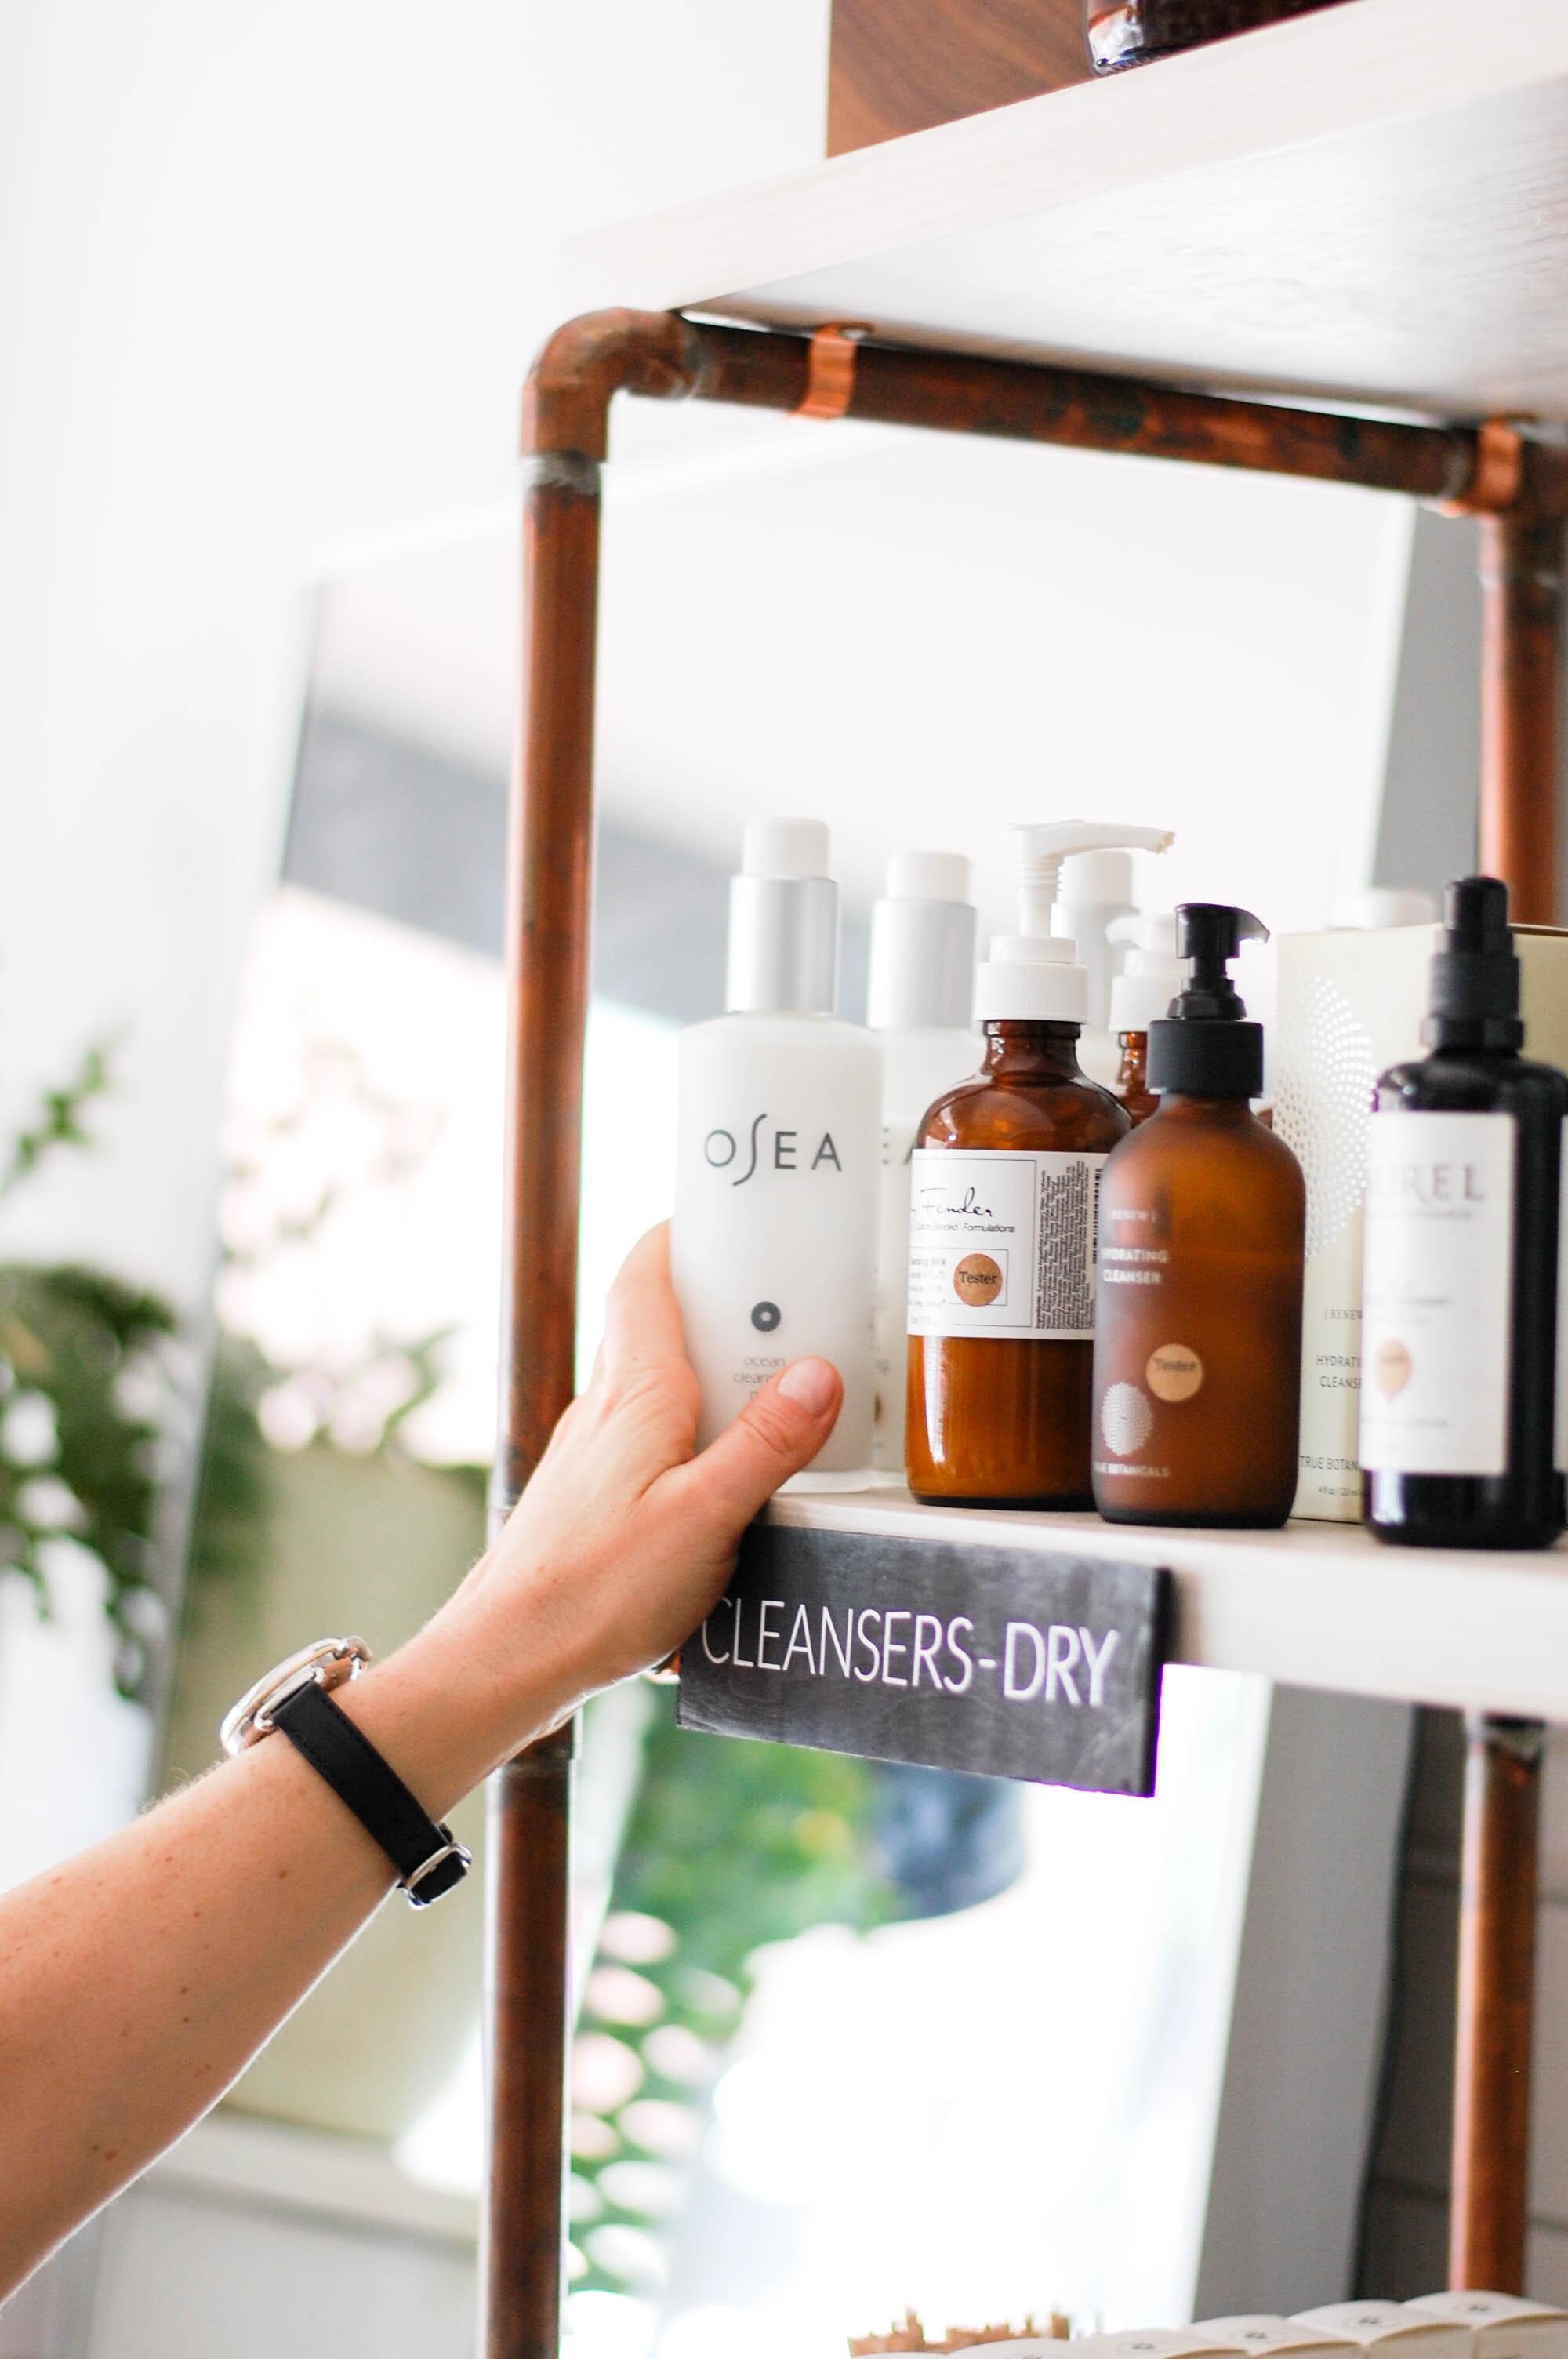 Kerri Axelrod grabbing OSEA Ocean Cleansing Milk, a key part in her skincare routine